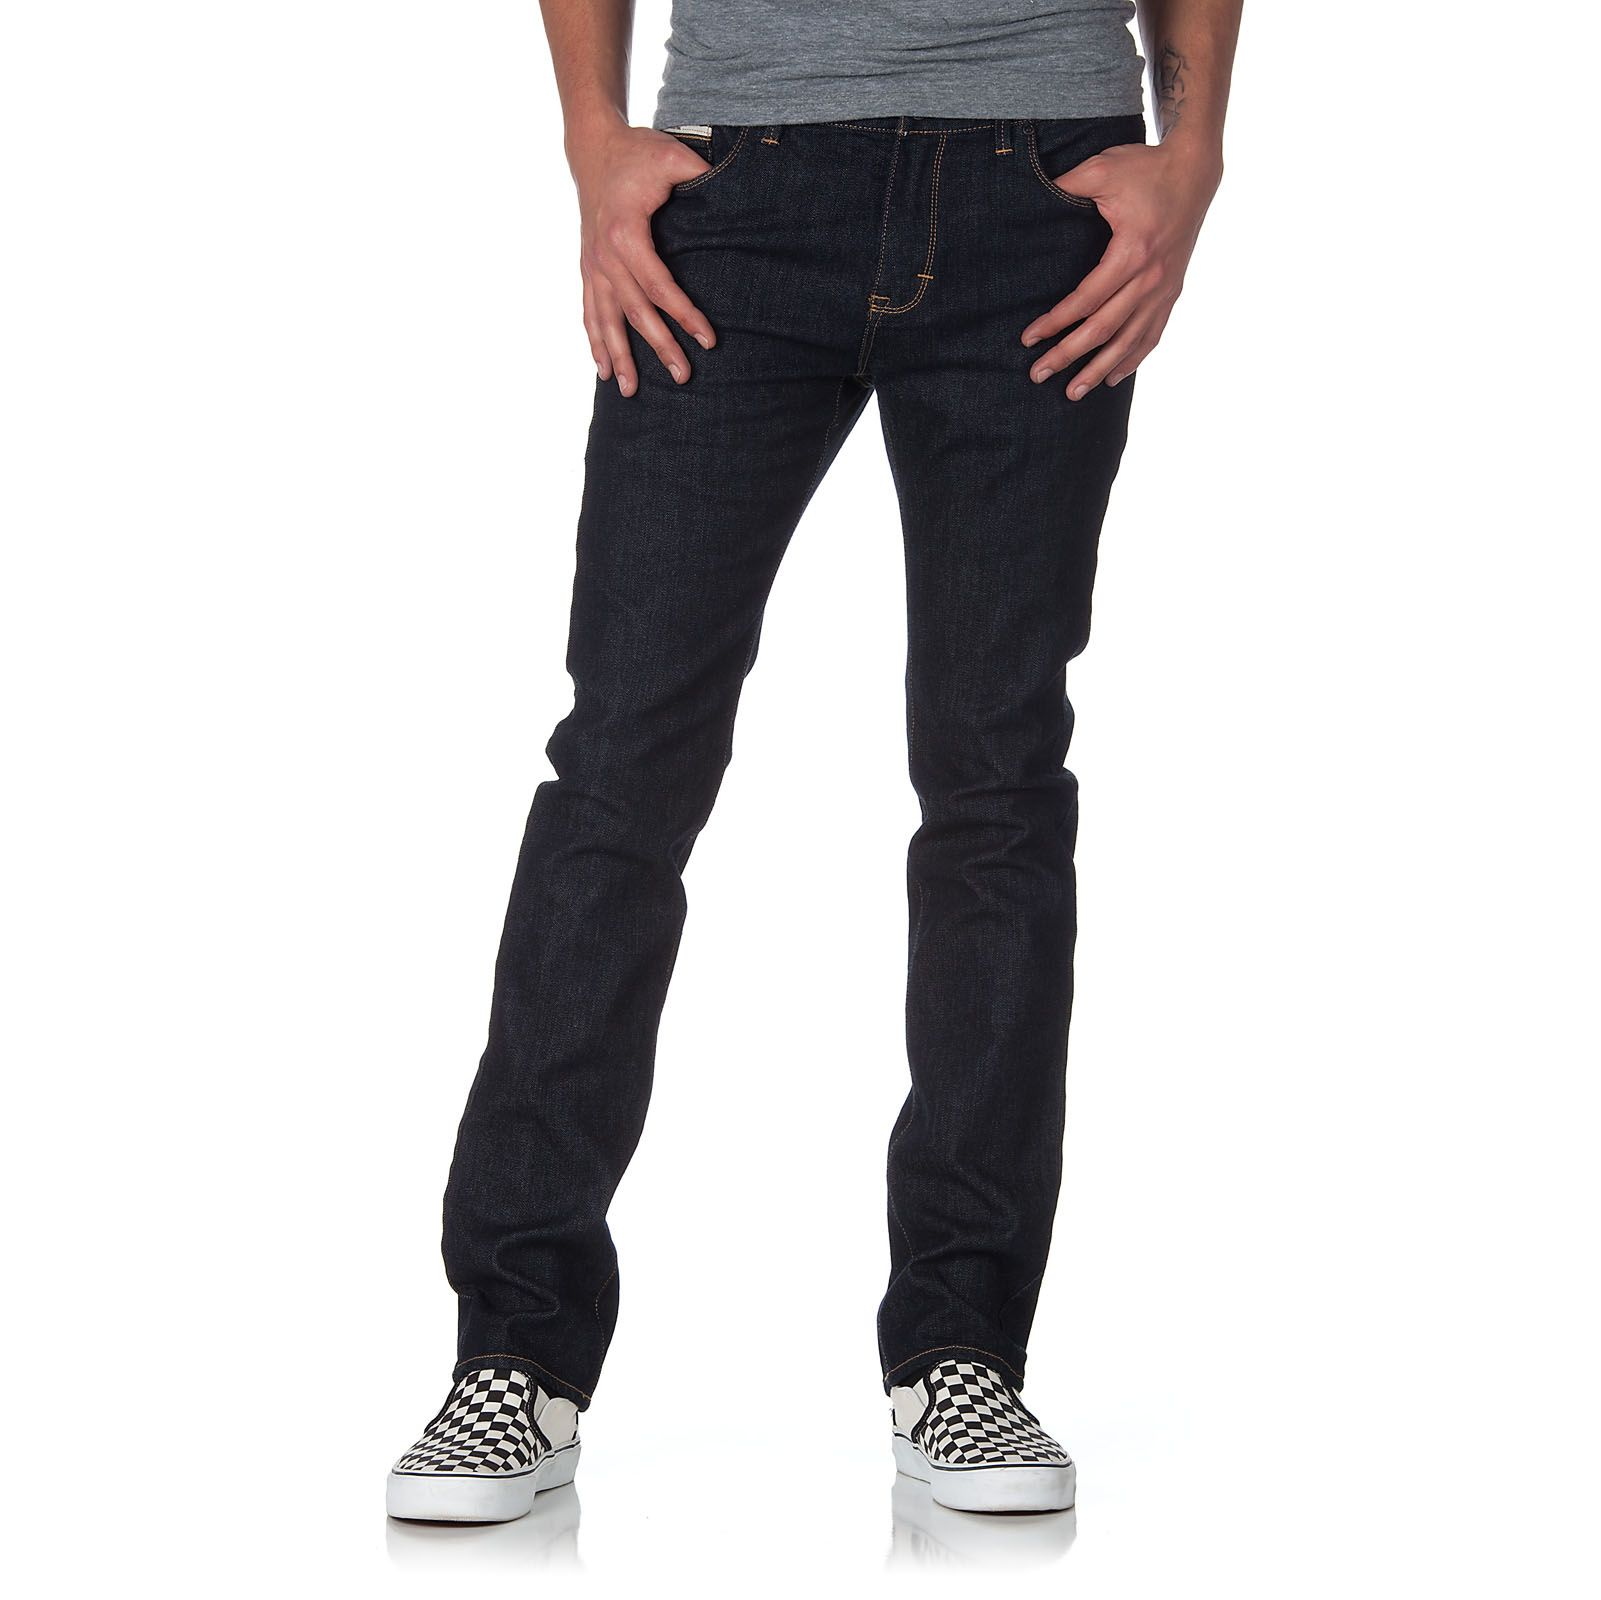 d5b5d46c52 Vans V76 Skinny Jeans...